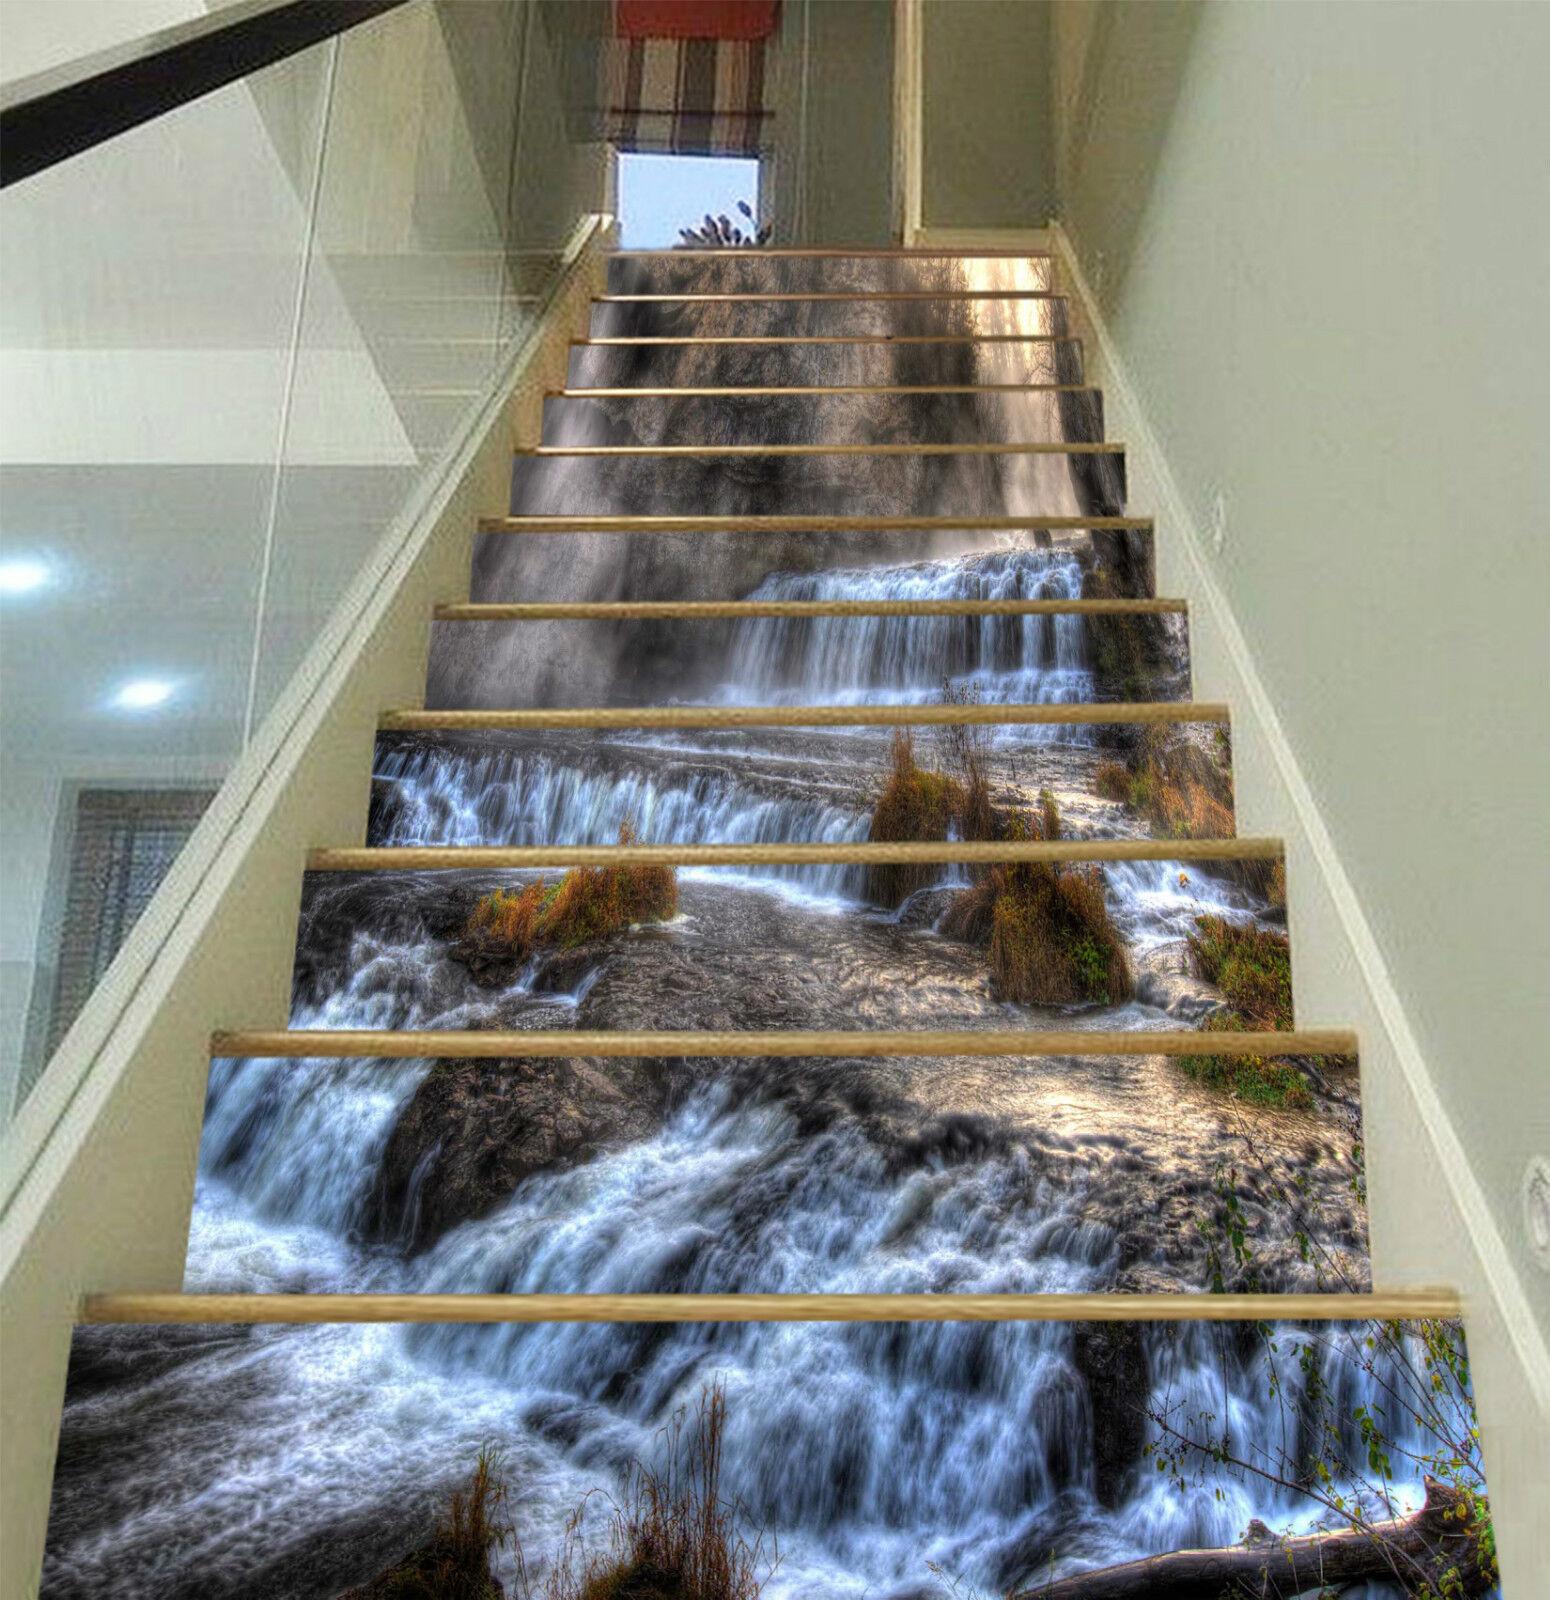 3D Groß Wasserfall 3Stair Risers Dekoration Fototapete Vinyl Aufkleber Tapete DE